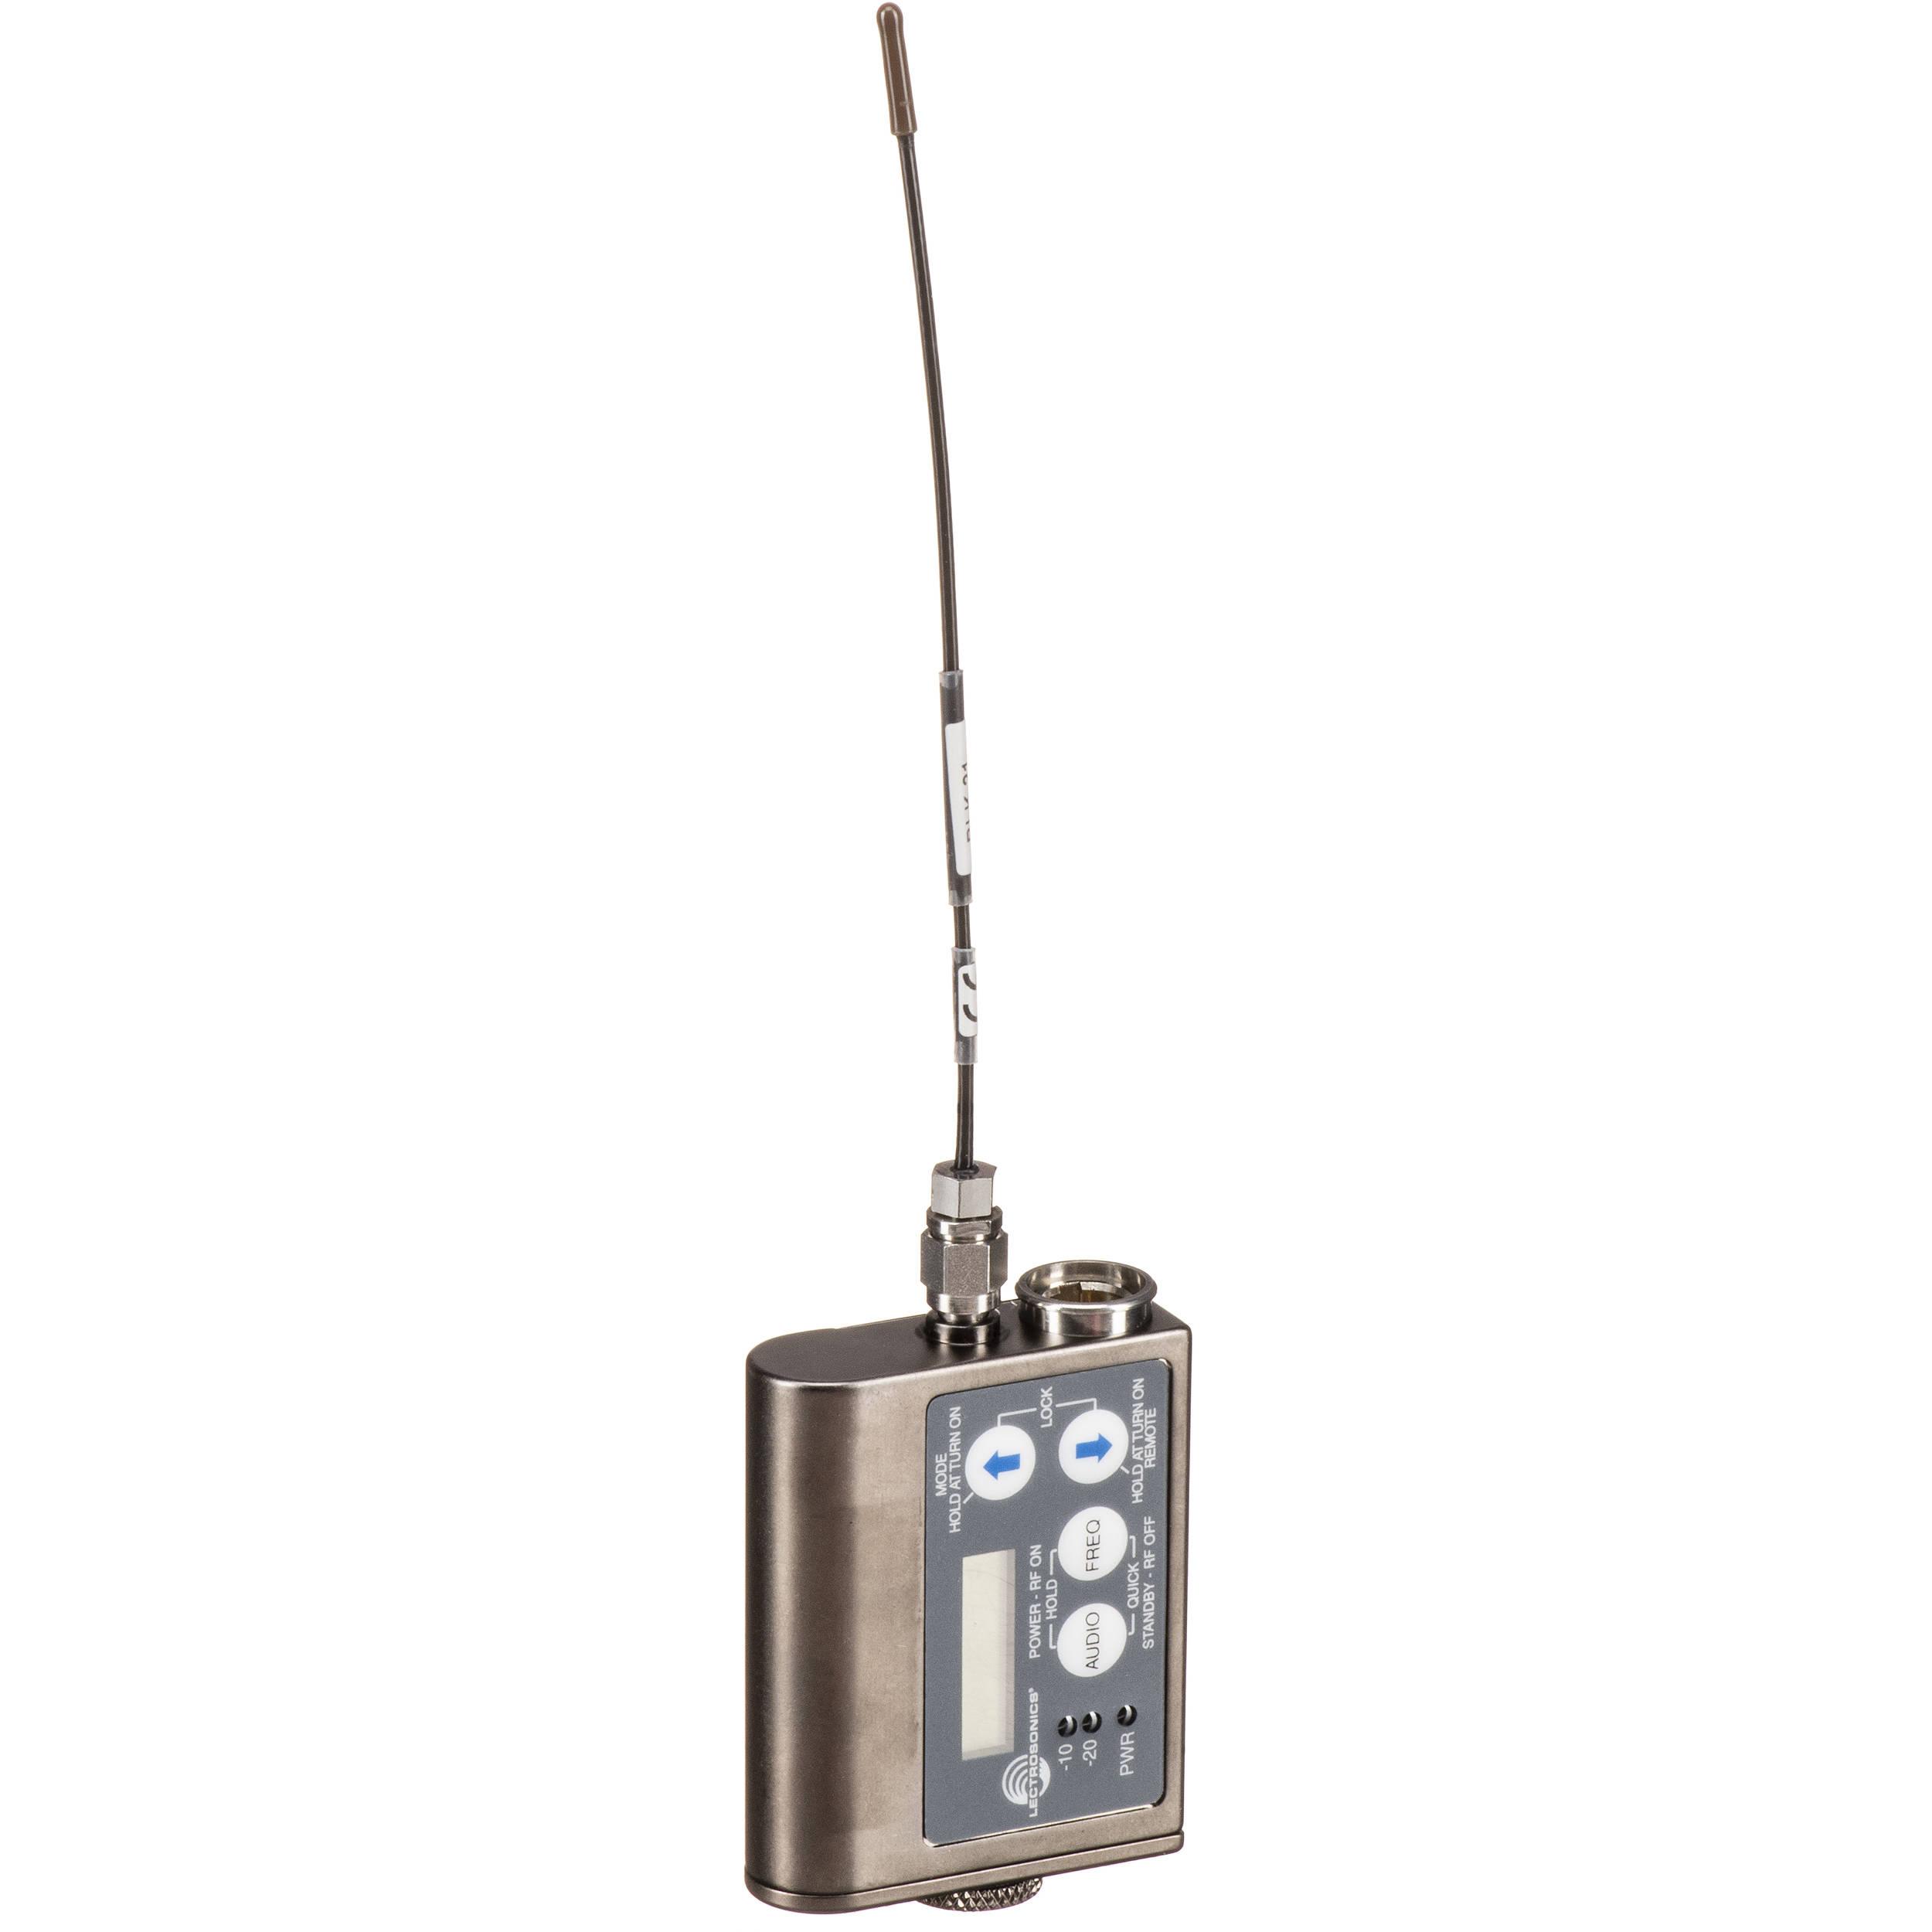 Miniature Fm Transmitter 4